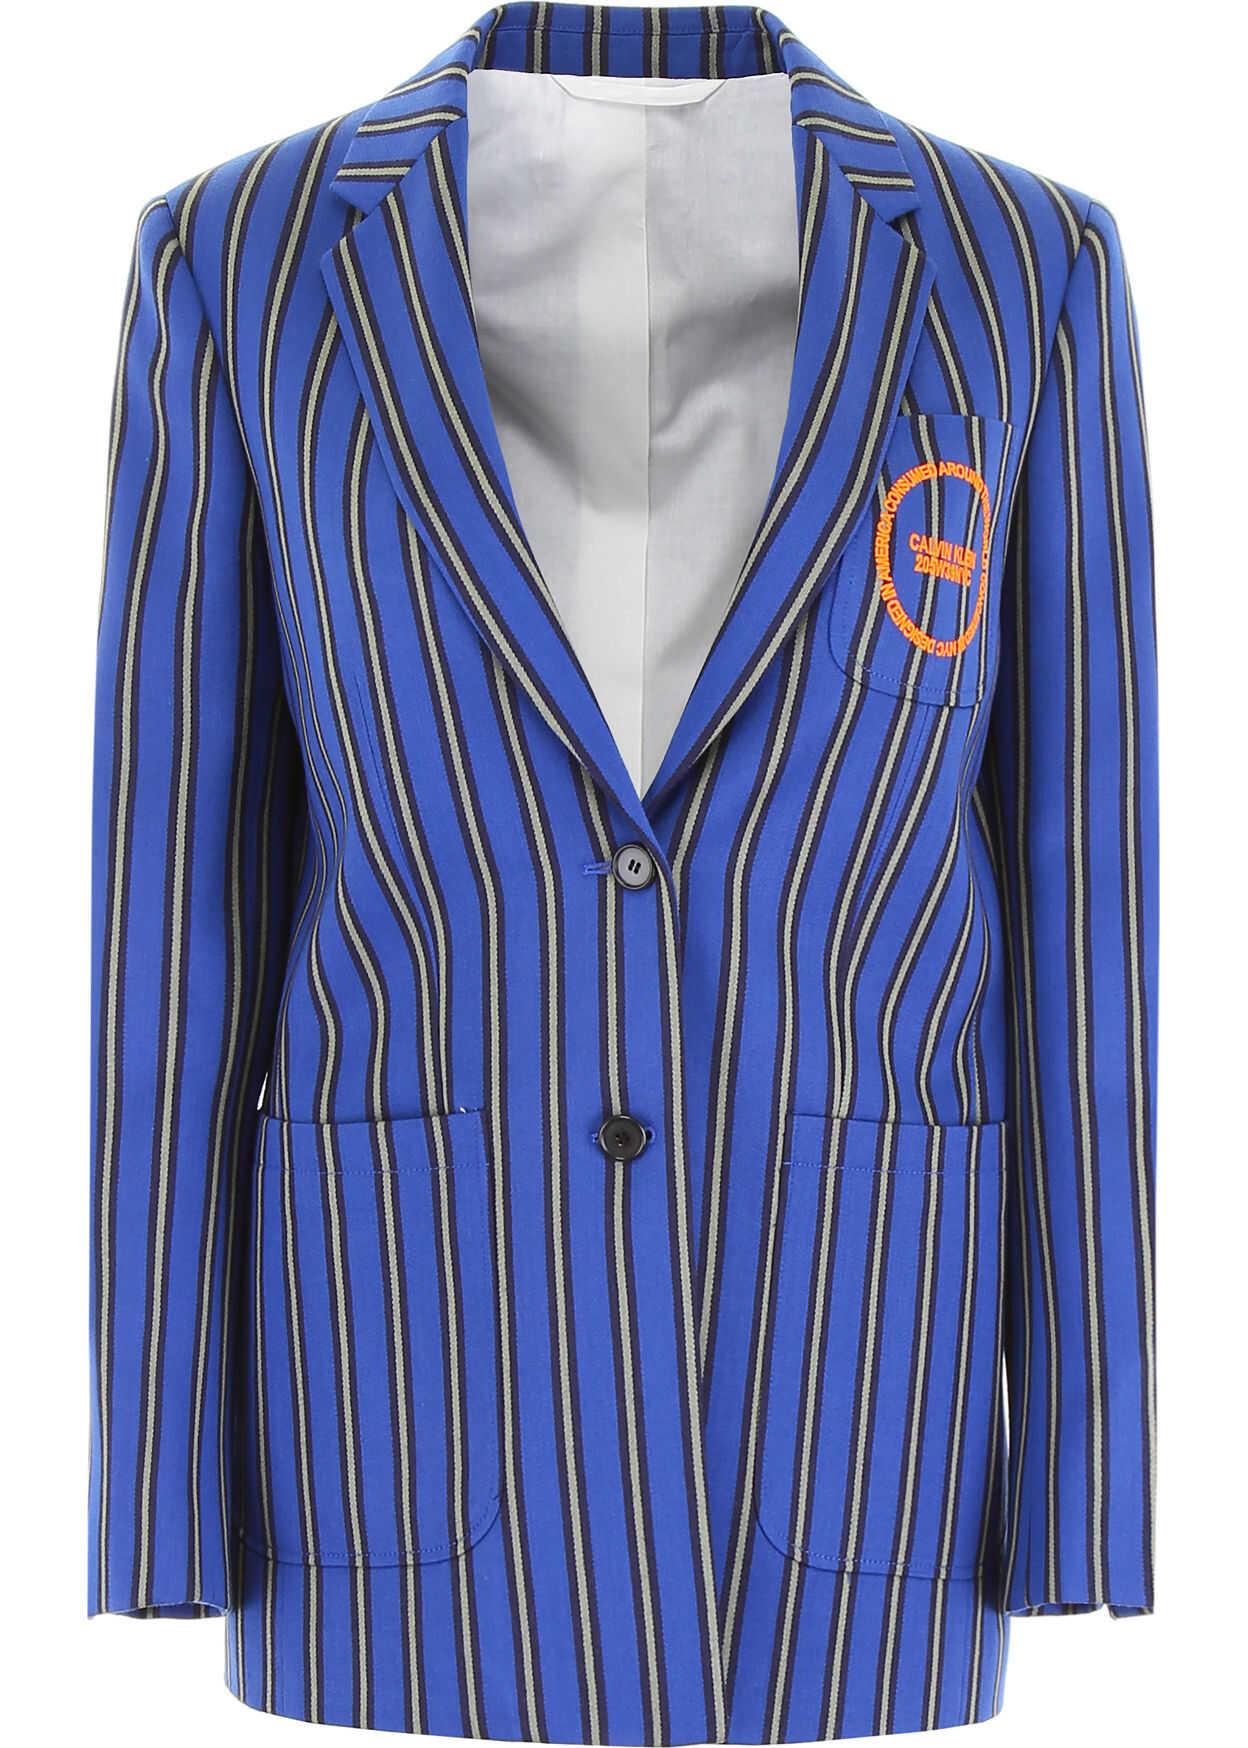 Calvin Klein 205W39NYC Striped Jacket BLUE